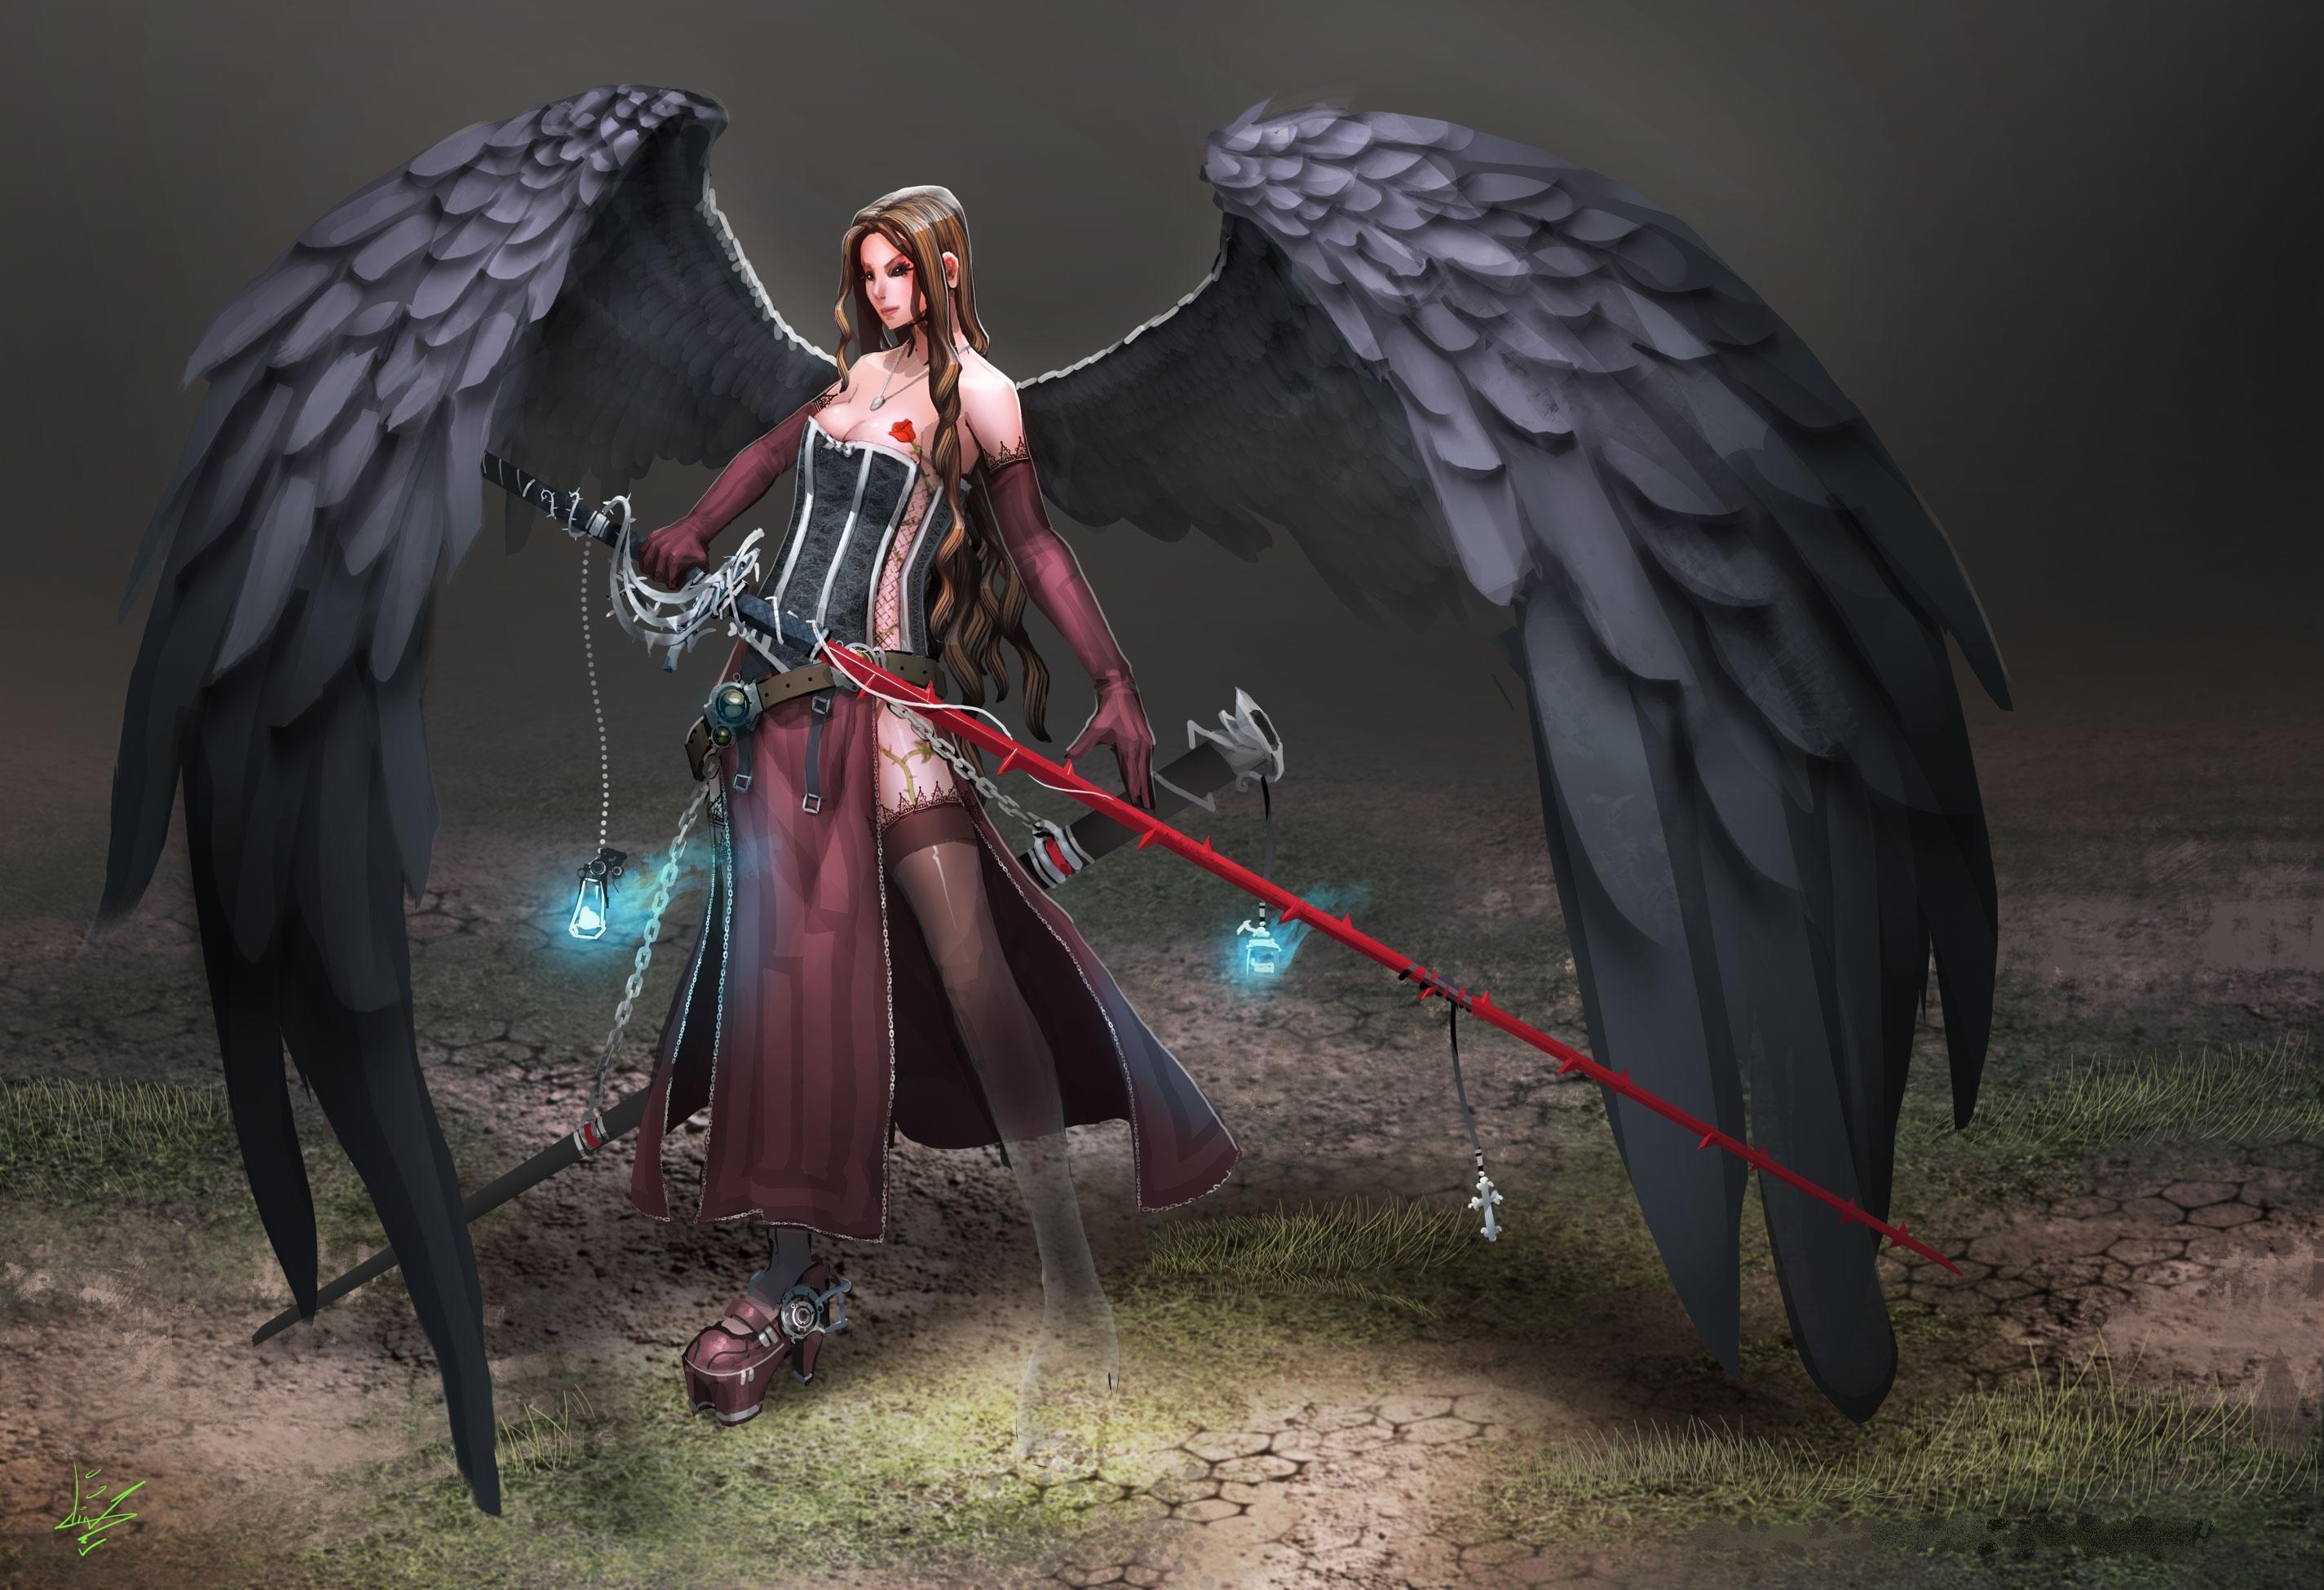 2017-03-20 – angel warrior screensavers backgrounds, #1439415